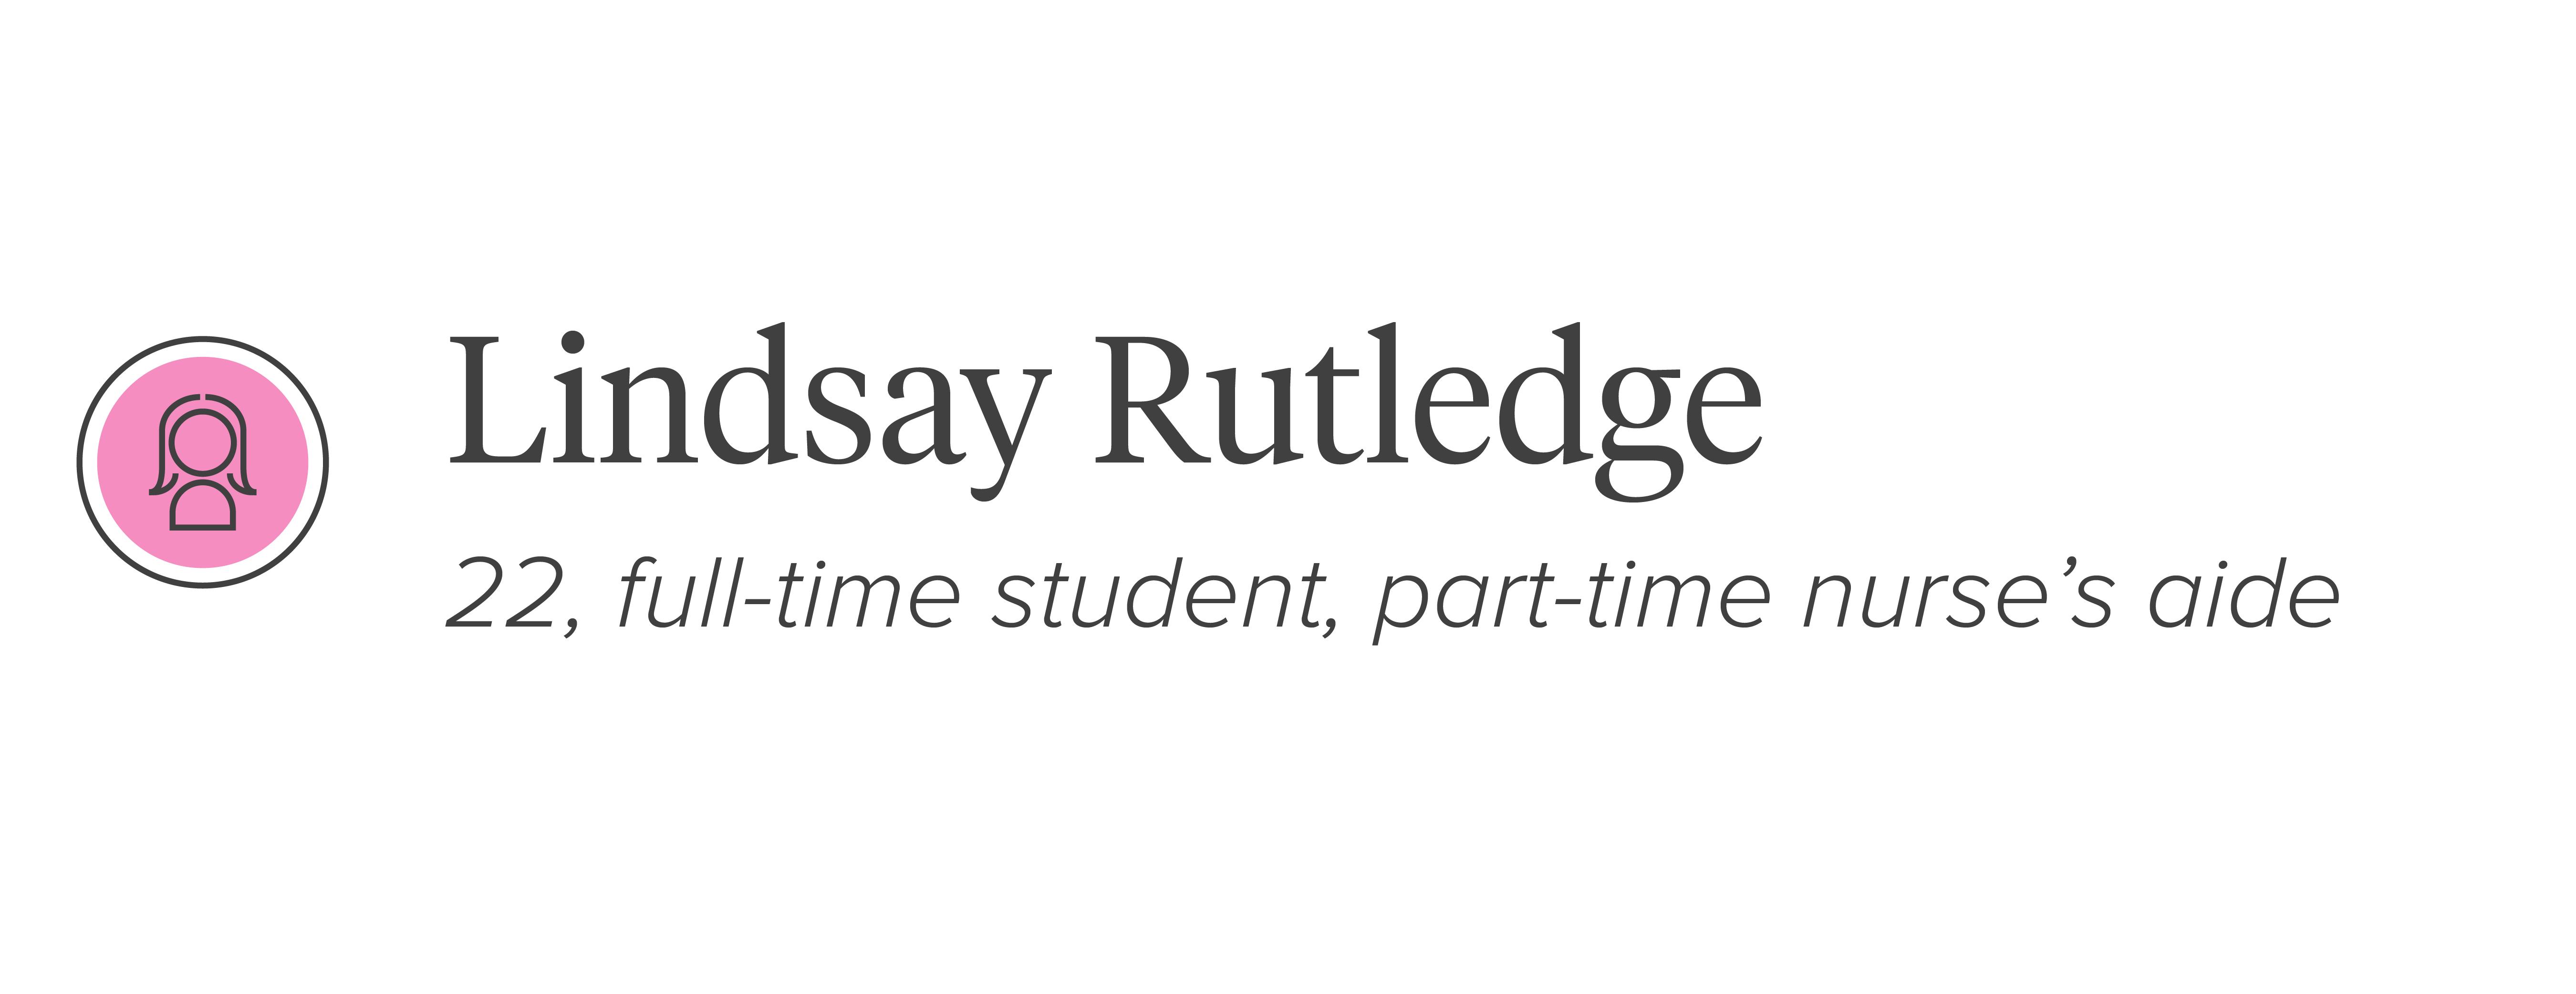 Lindsay Rutledge